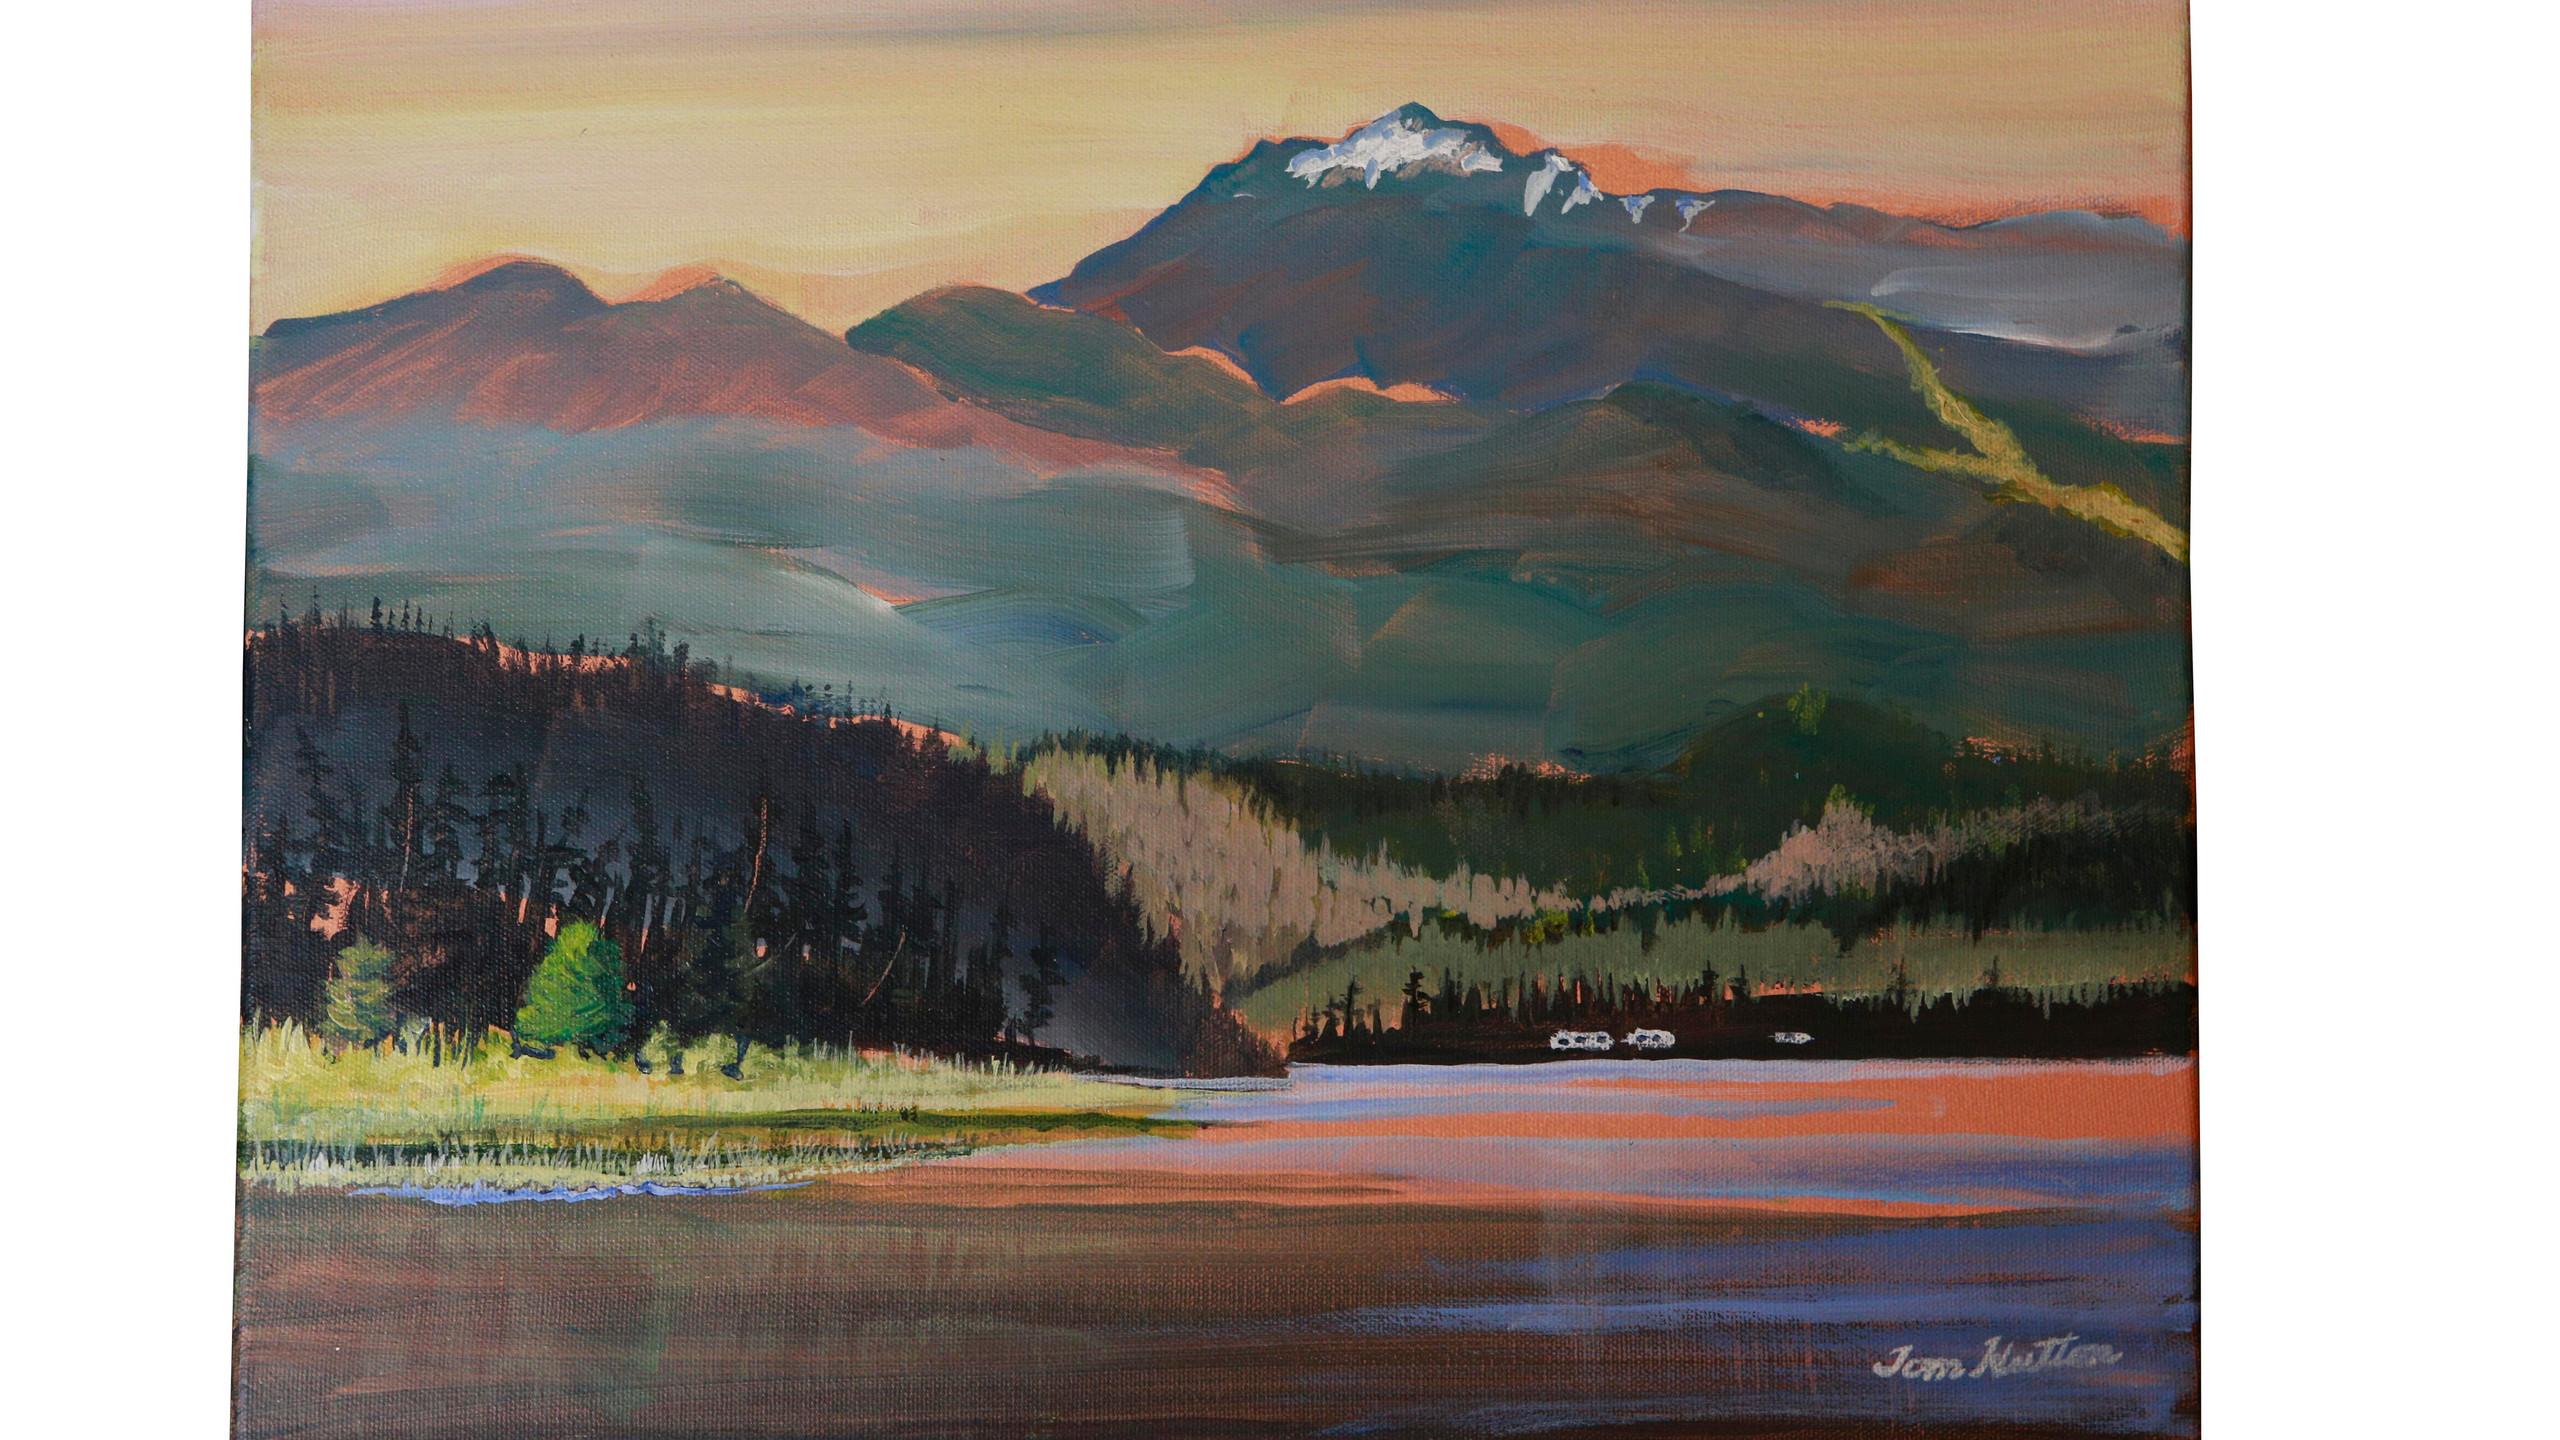 Hutton, Tom - Whistler Peak